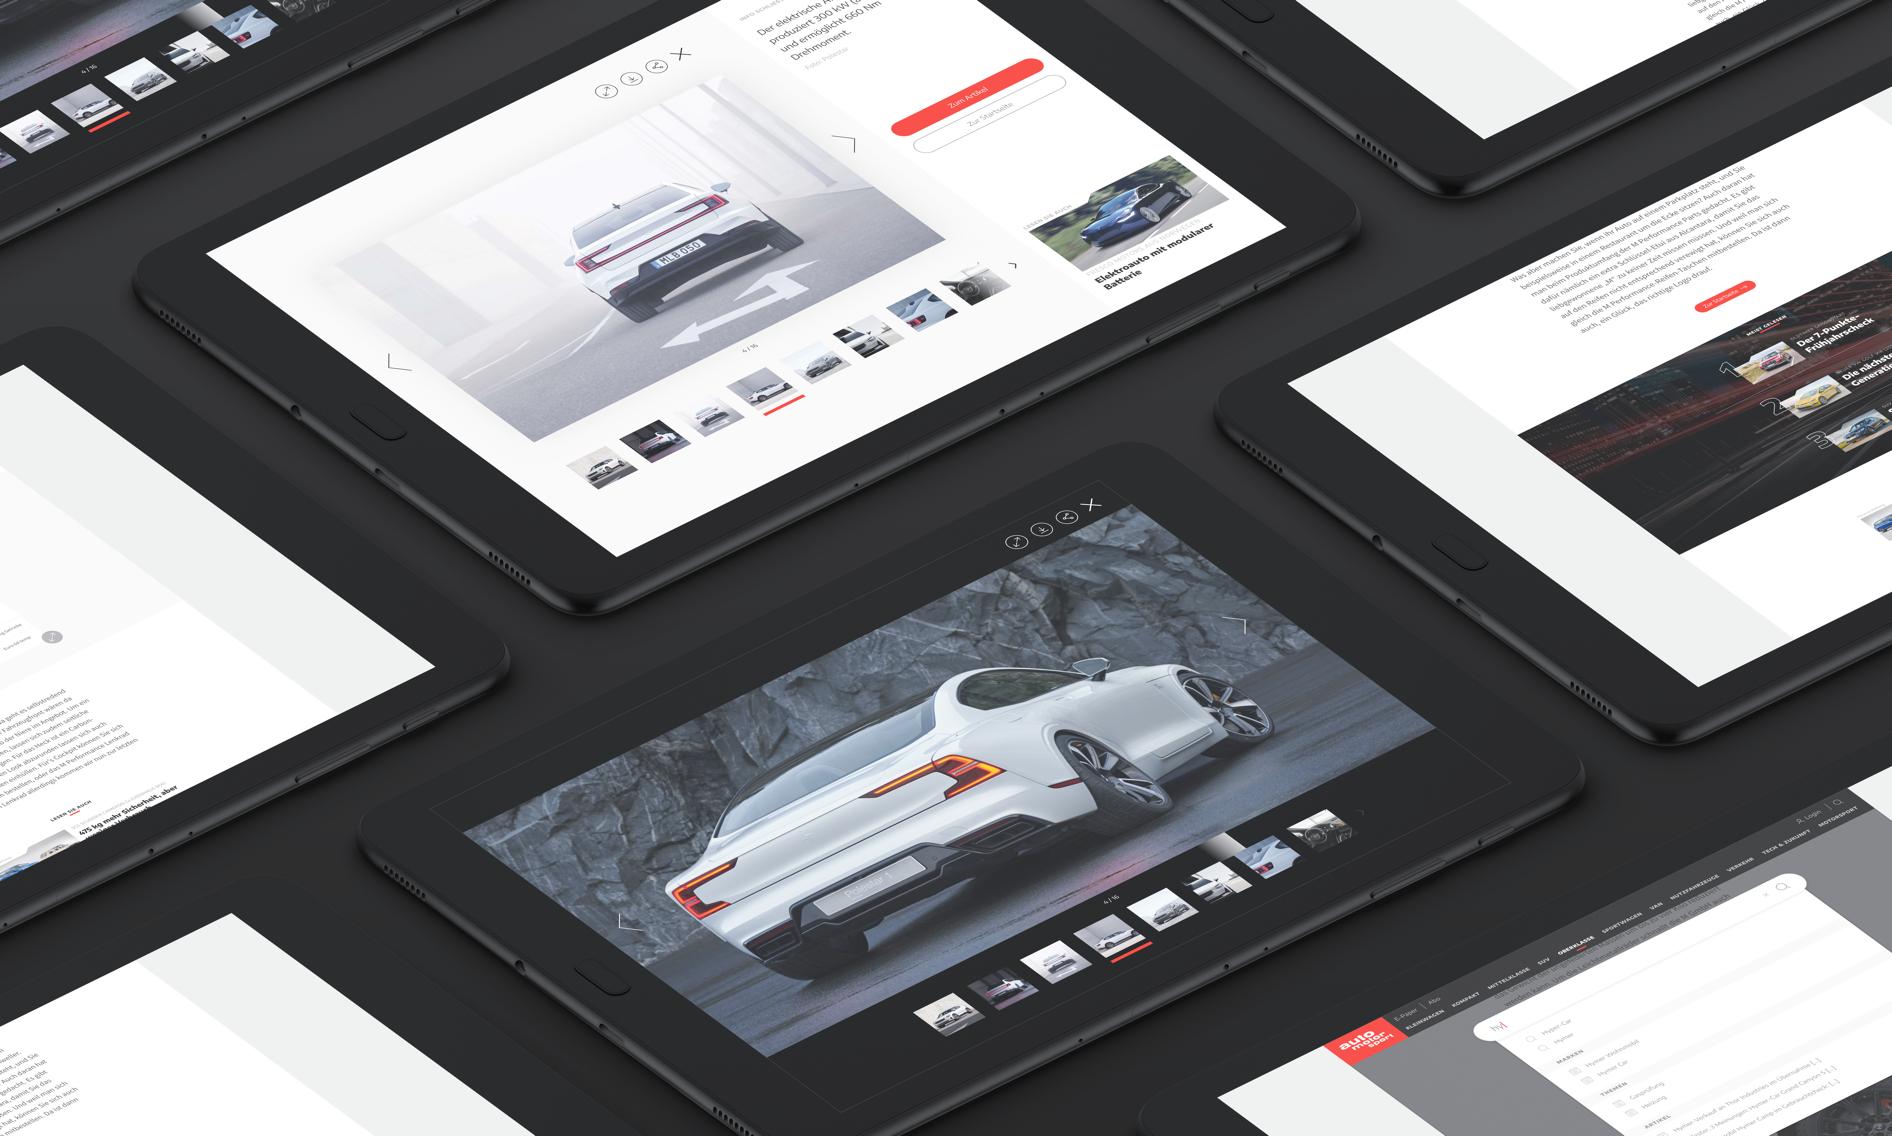 AMS-Bildergalerie-Tablet